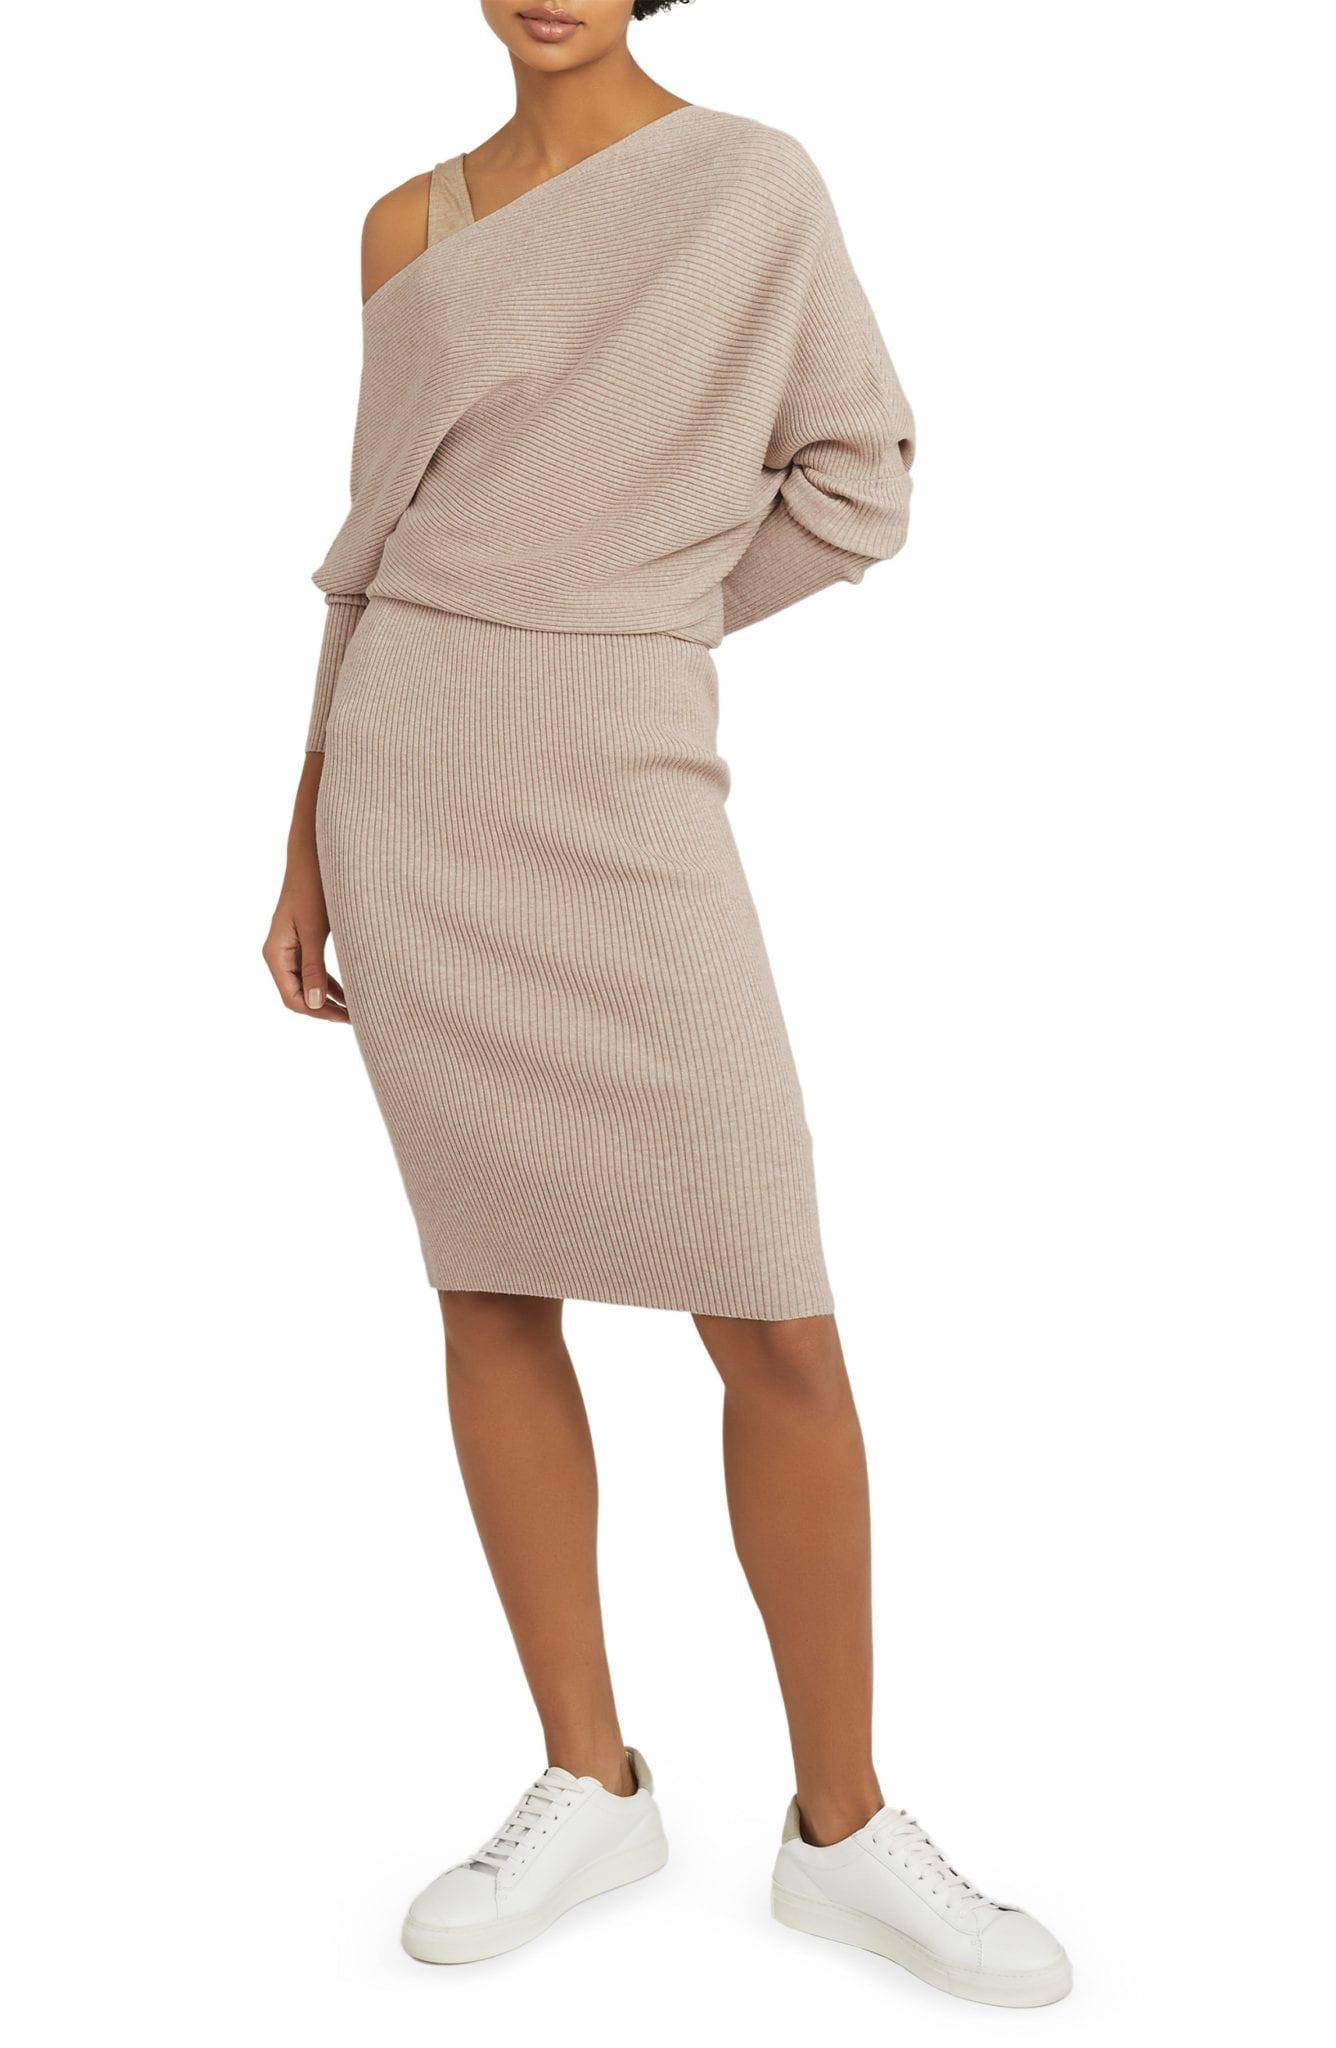 REISS Lara One-Shoulder Long Sleeve Sweater Dress